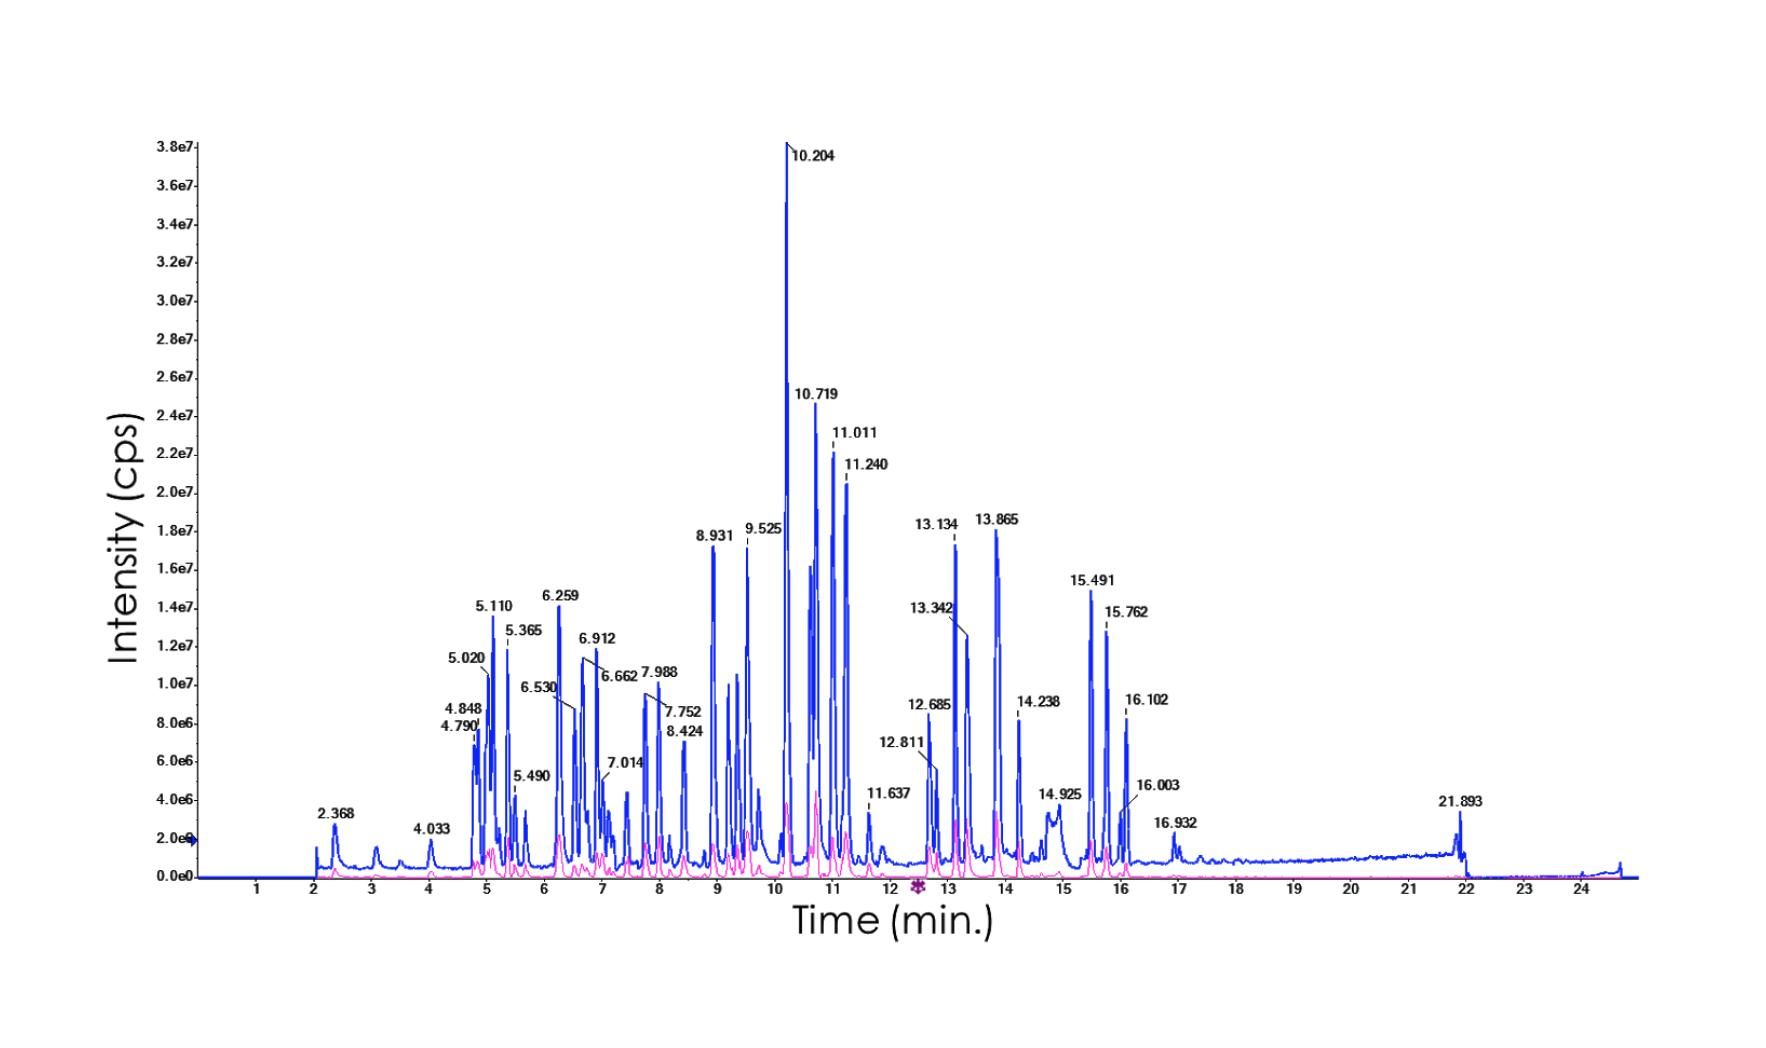 Bottom-up proteomic spectrometer assays chart - Amino acid sequence confirmation, peptide mass fingerprinting, glycopeptide identification